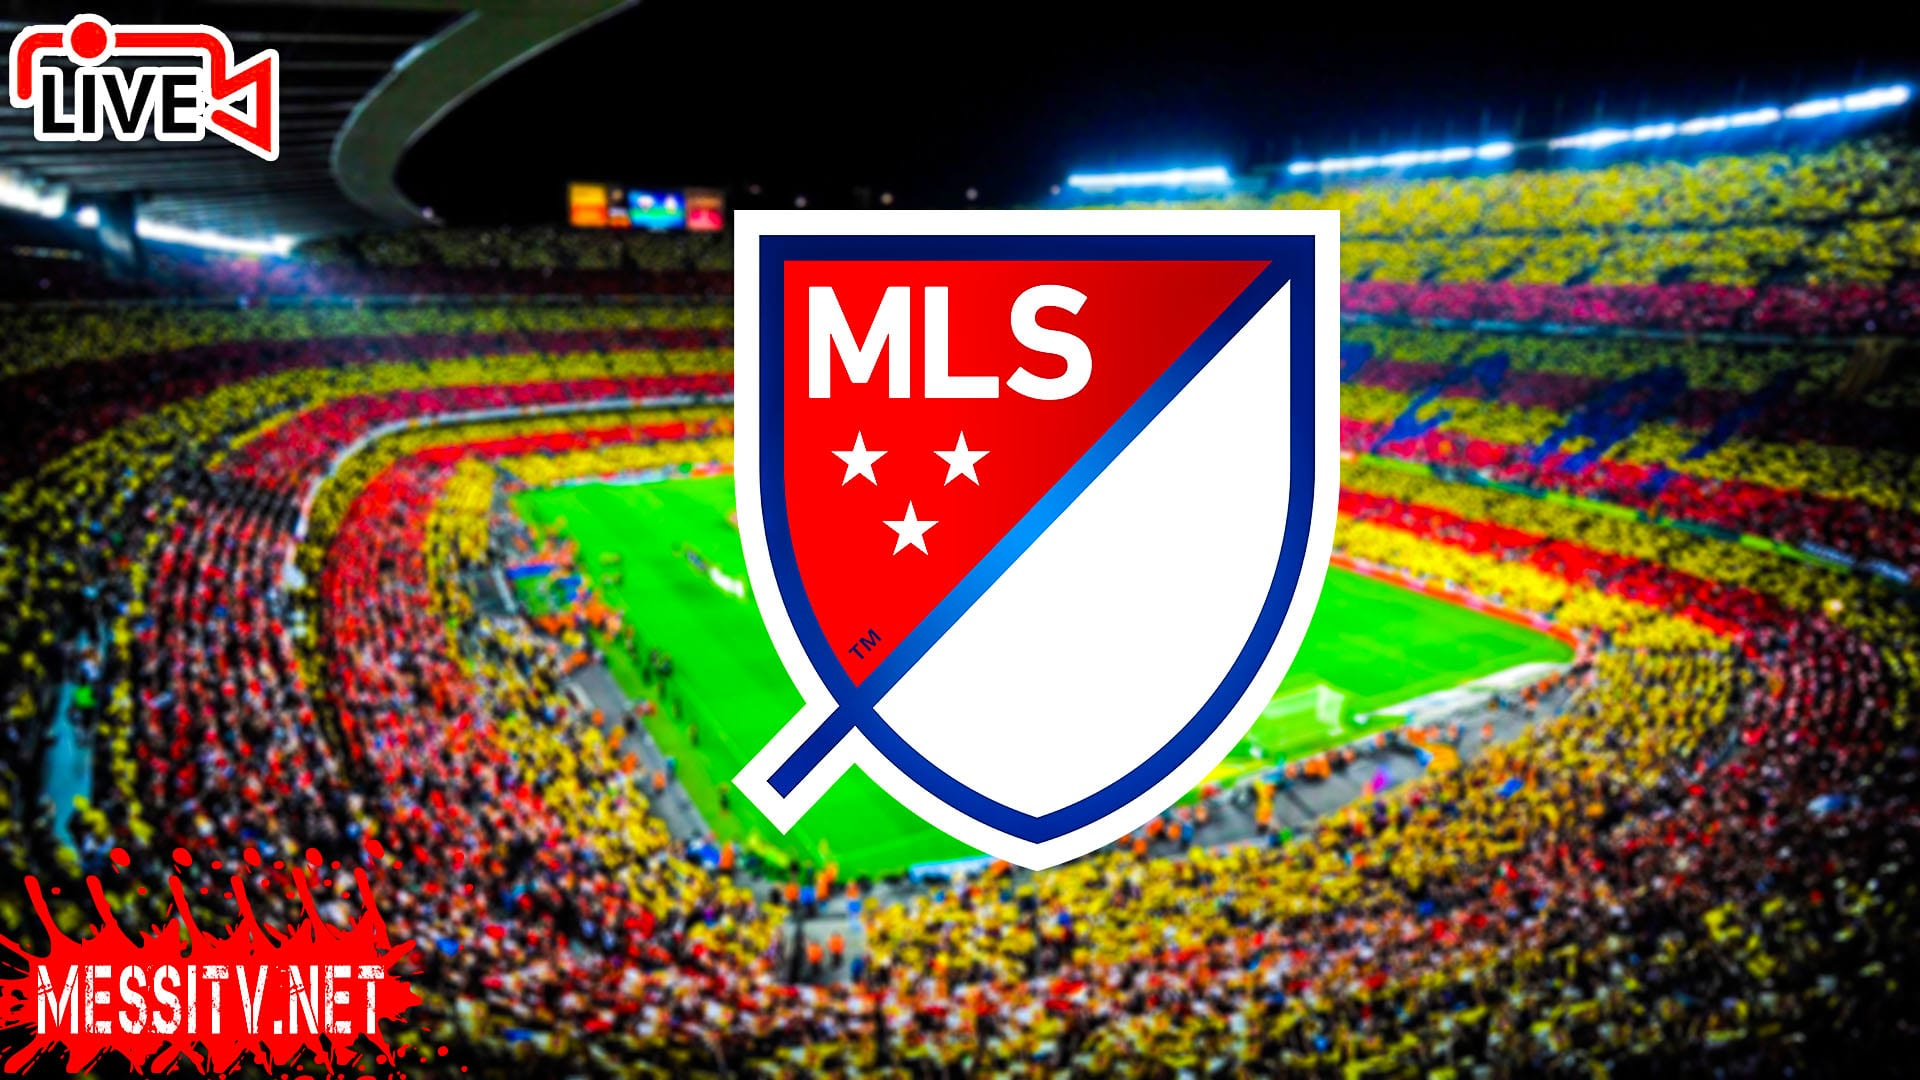 Major League Soccer, watch MLS Live, New York Red Bulls vs Miami, Cincinnati vs Philadelphia, Seattle vs Vancouver, Minnesota vs Colorado #rbnyvmia #cinvphi #seavvan #minvcol, Montréal #FCMTL #IMFC Cincinnati #FCCincy, Portland #RCTID LA Galaxy #LAGalaxy, Chicago #CFFC #cf97 Miami #InterMiamiCF, Orlando #VamosOrlando Toronto #TheyWillSeeRed #TFCLive, New York City #VamosNYC #nycfc Columbus #Crew96 #PorColumbus, Dallas #DTID #SomosFCD Salt Lake #RSL, New England #NERevs #LFG New York RB #RBNY, Houston #ForeverOrange #HoldItDown #DejaloTodo Vancouver #VWFC, San Jose #Quakes74 #VamosSJ Kansas City #OneSportingWay, LAFC #LAFC Colorado #Rapids96, DC #DCU Minnesota #MNUFC, Austin #VERDE #LISTOS Seattle #SoundersMatchday, Atlanta #Vamosatlutd #UniteAndConquer Philadelphia #PhilaUnion #DOOP, New York Red Bulls #RBNY Nashville #EveryoneN, DC United #DCU